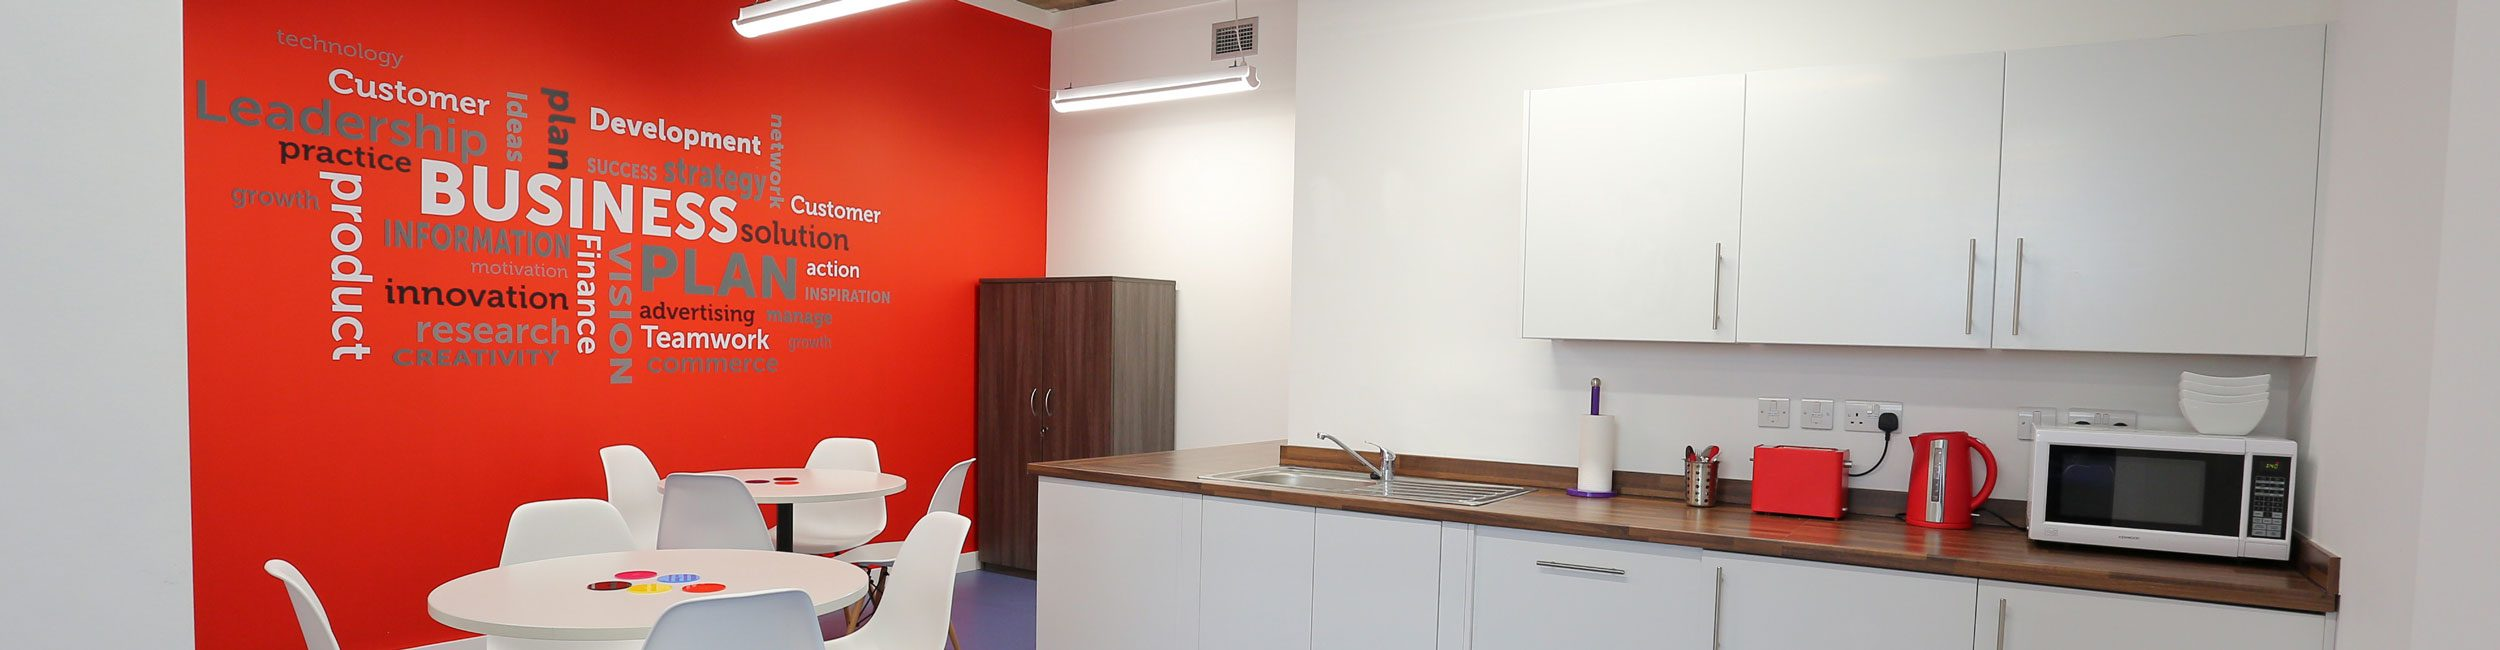 Enterprise Foundation - Enaflo Interiors